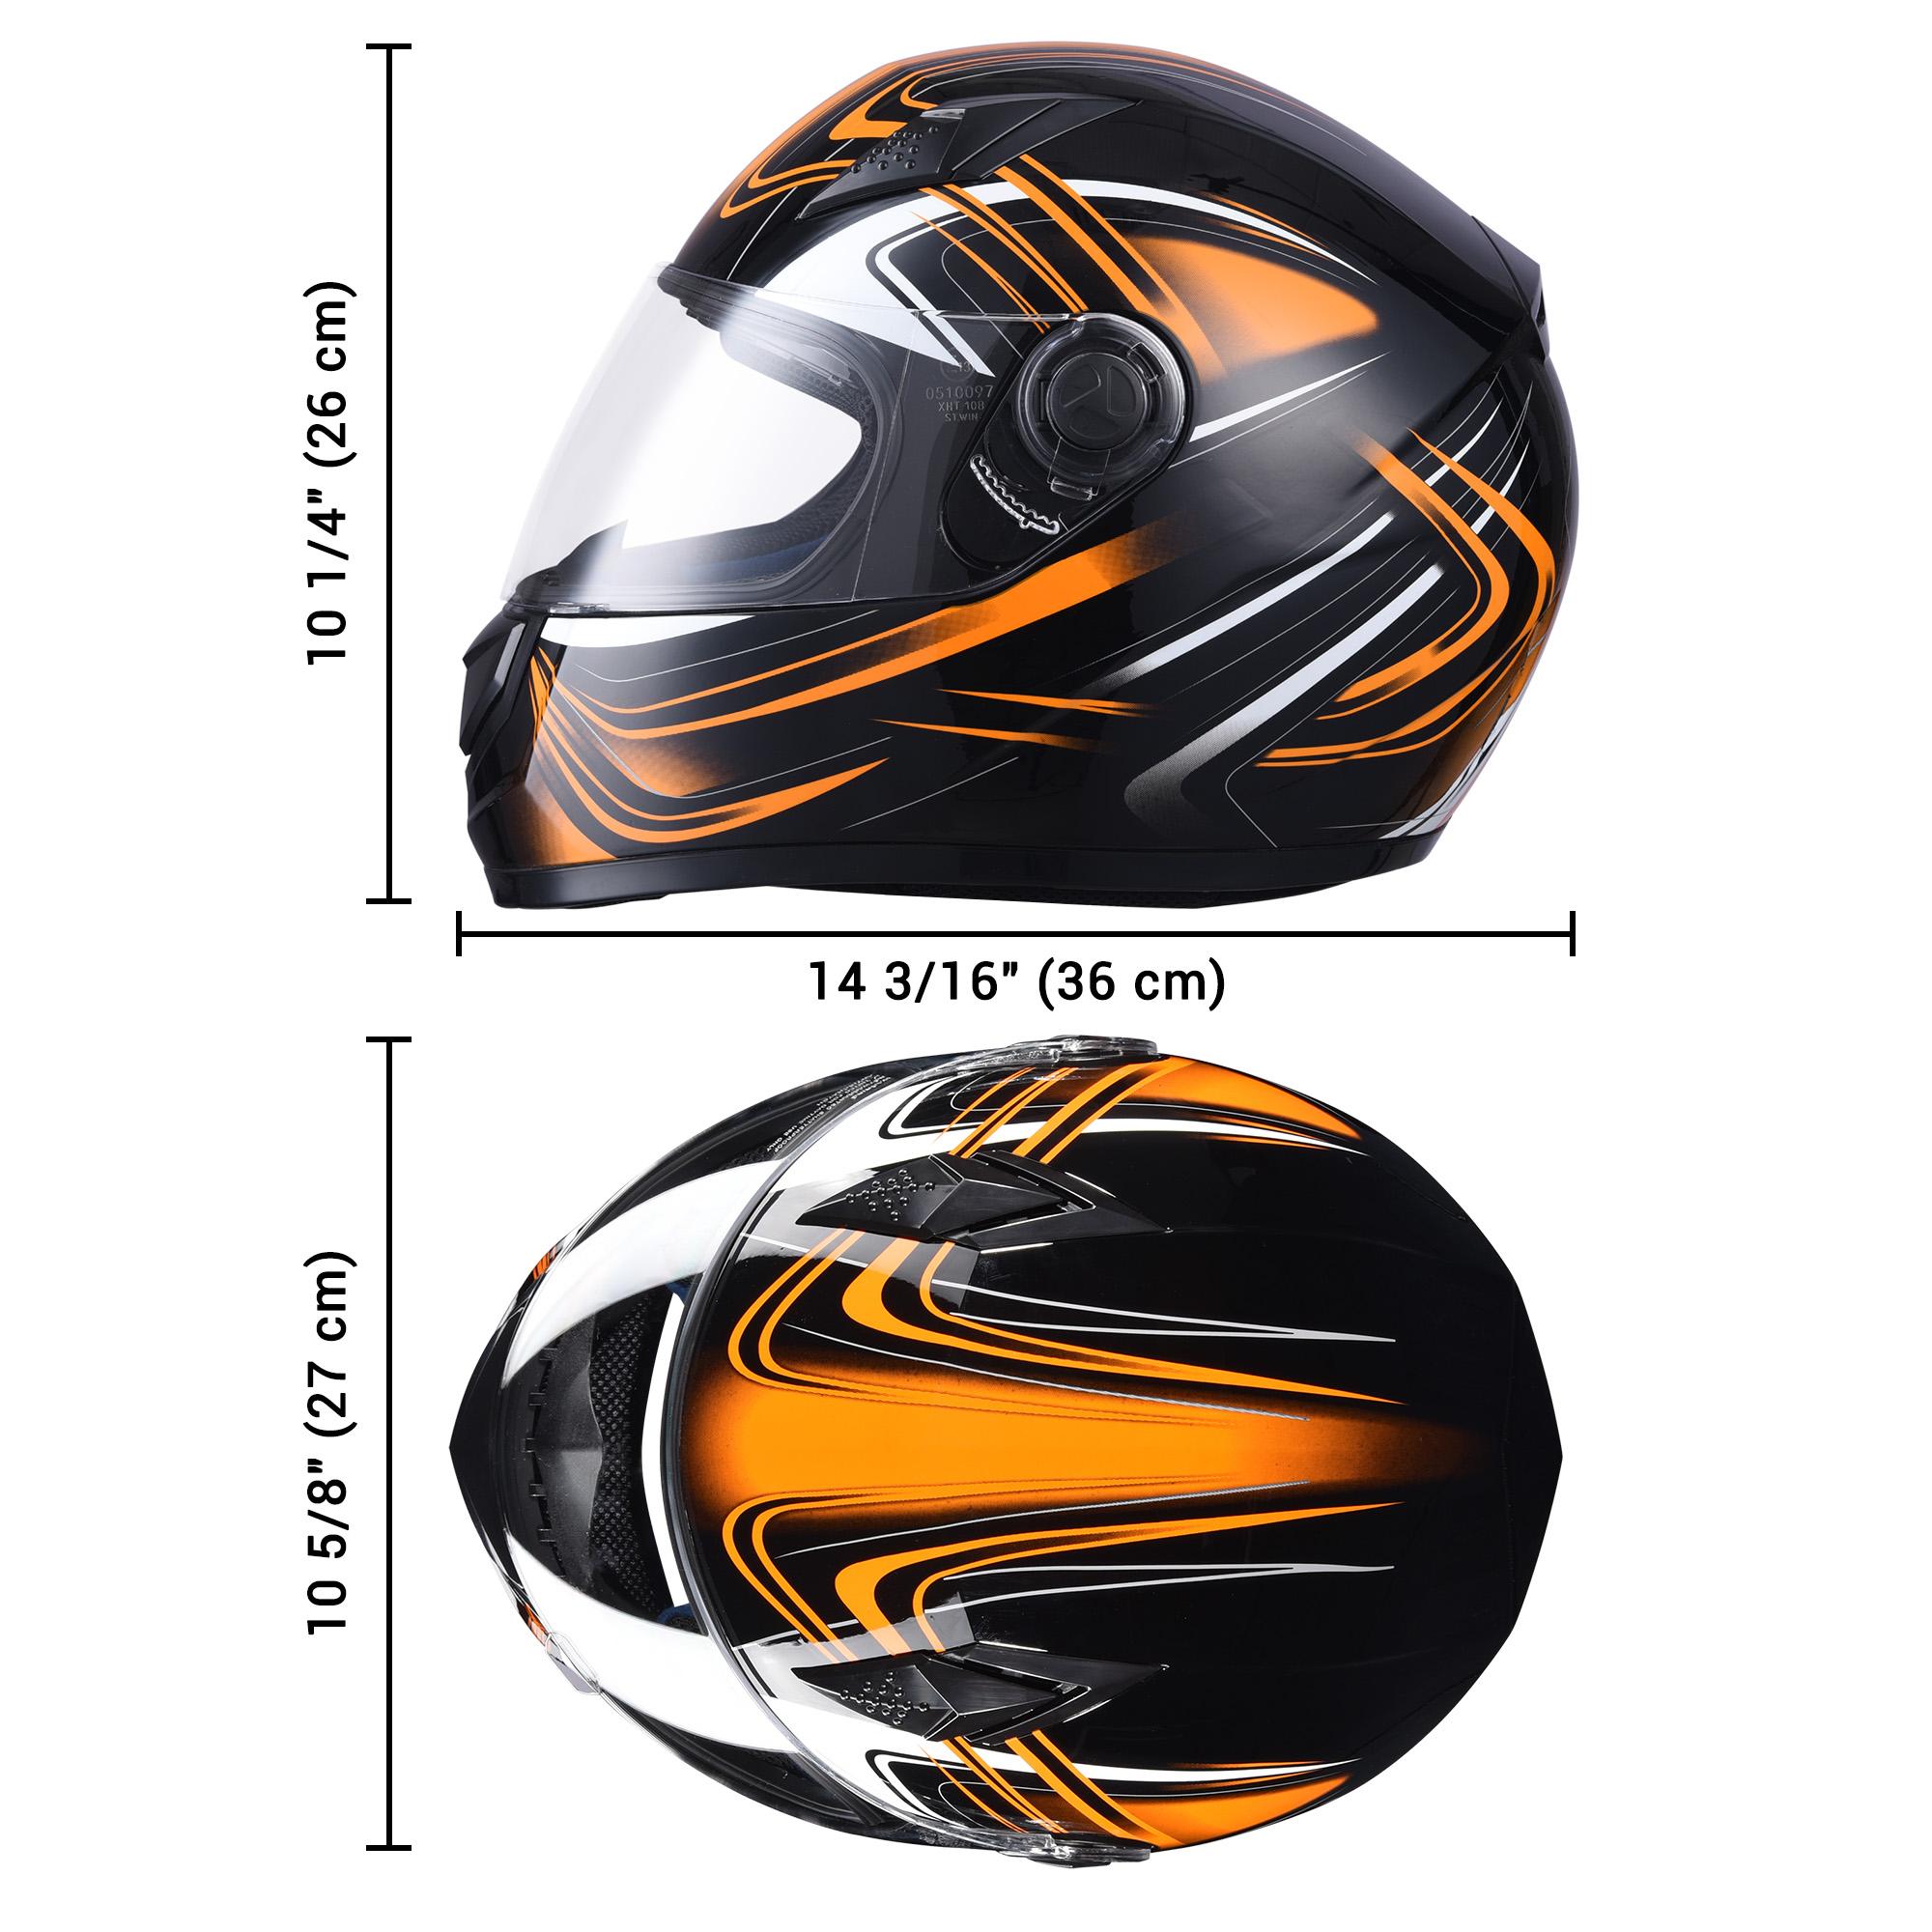 miniature 46 - AHR K12 Full Face Motorcycle Helmet DOT Air Vents Clear Visor Racing S M L XL